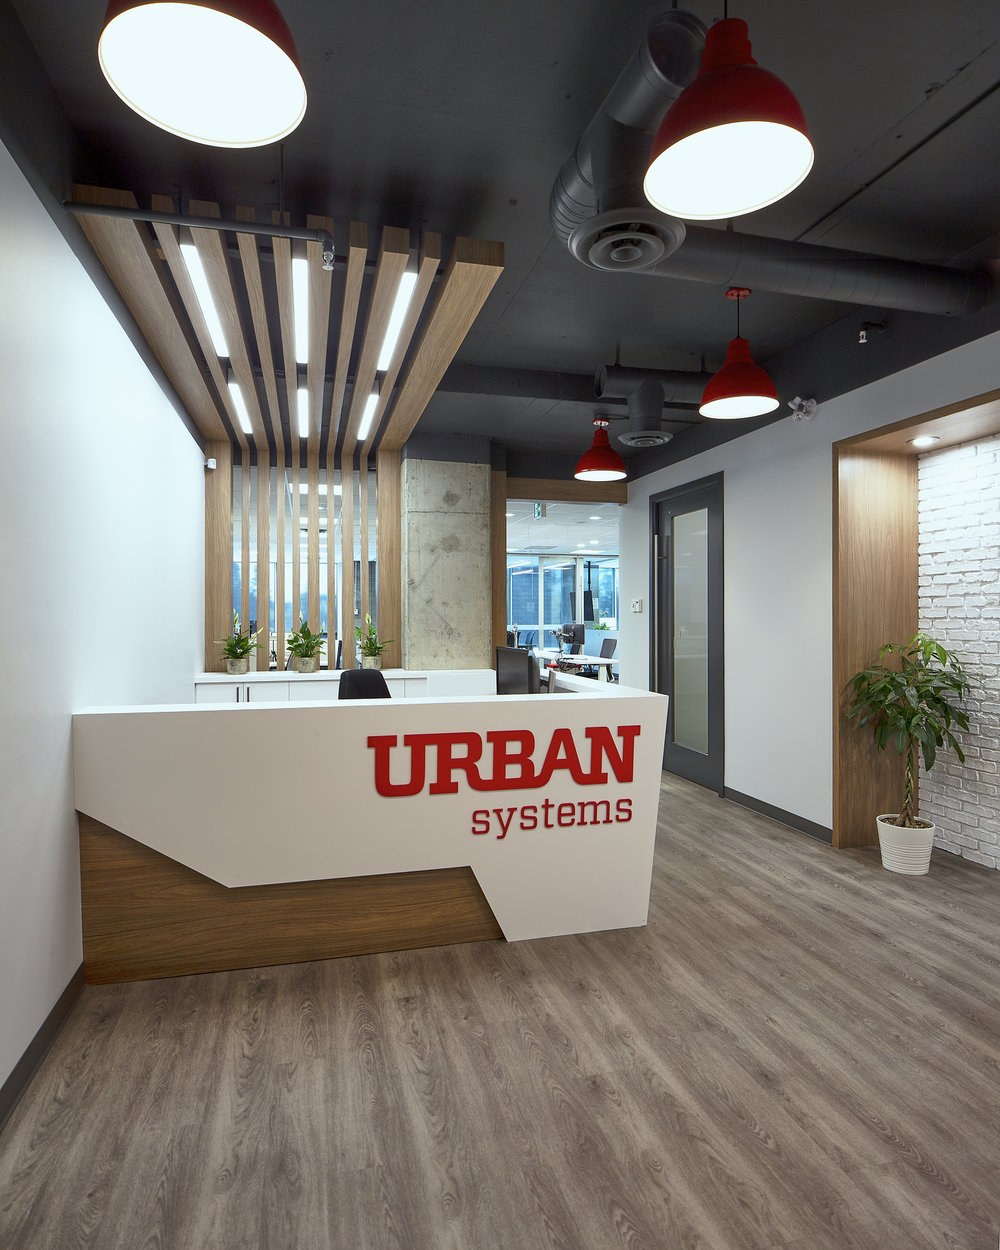 20180425-urban-systems-0127_1_1.jpg